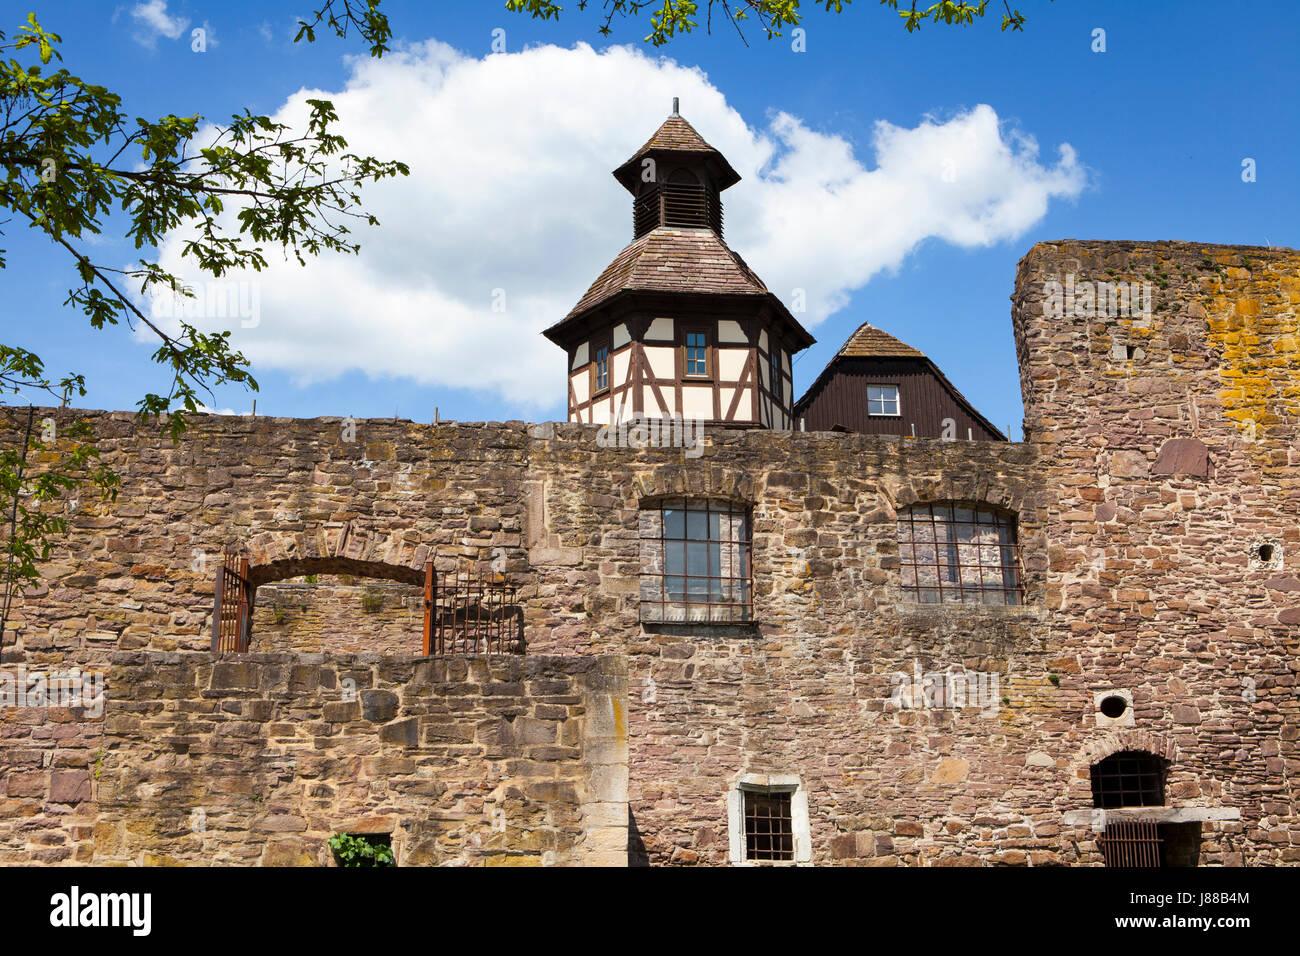 Burg Wülmersen castle, region Kassel, Upper Weser Valley,  Weser Uplands, Weserbergland, Reinhardswald, Hesse, Germany Stock Photo